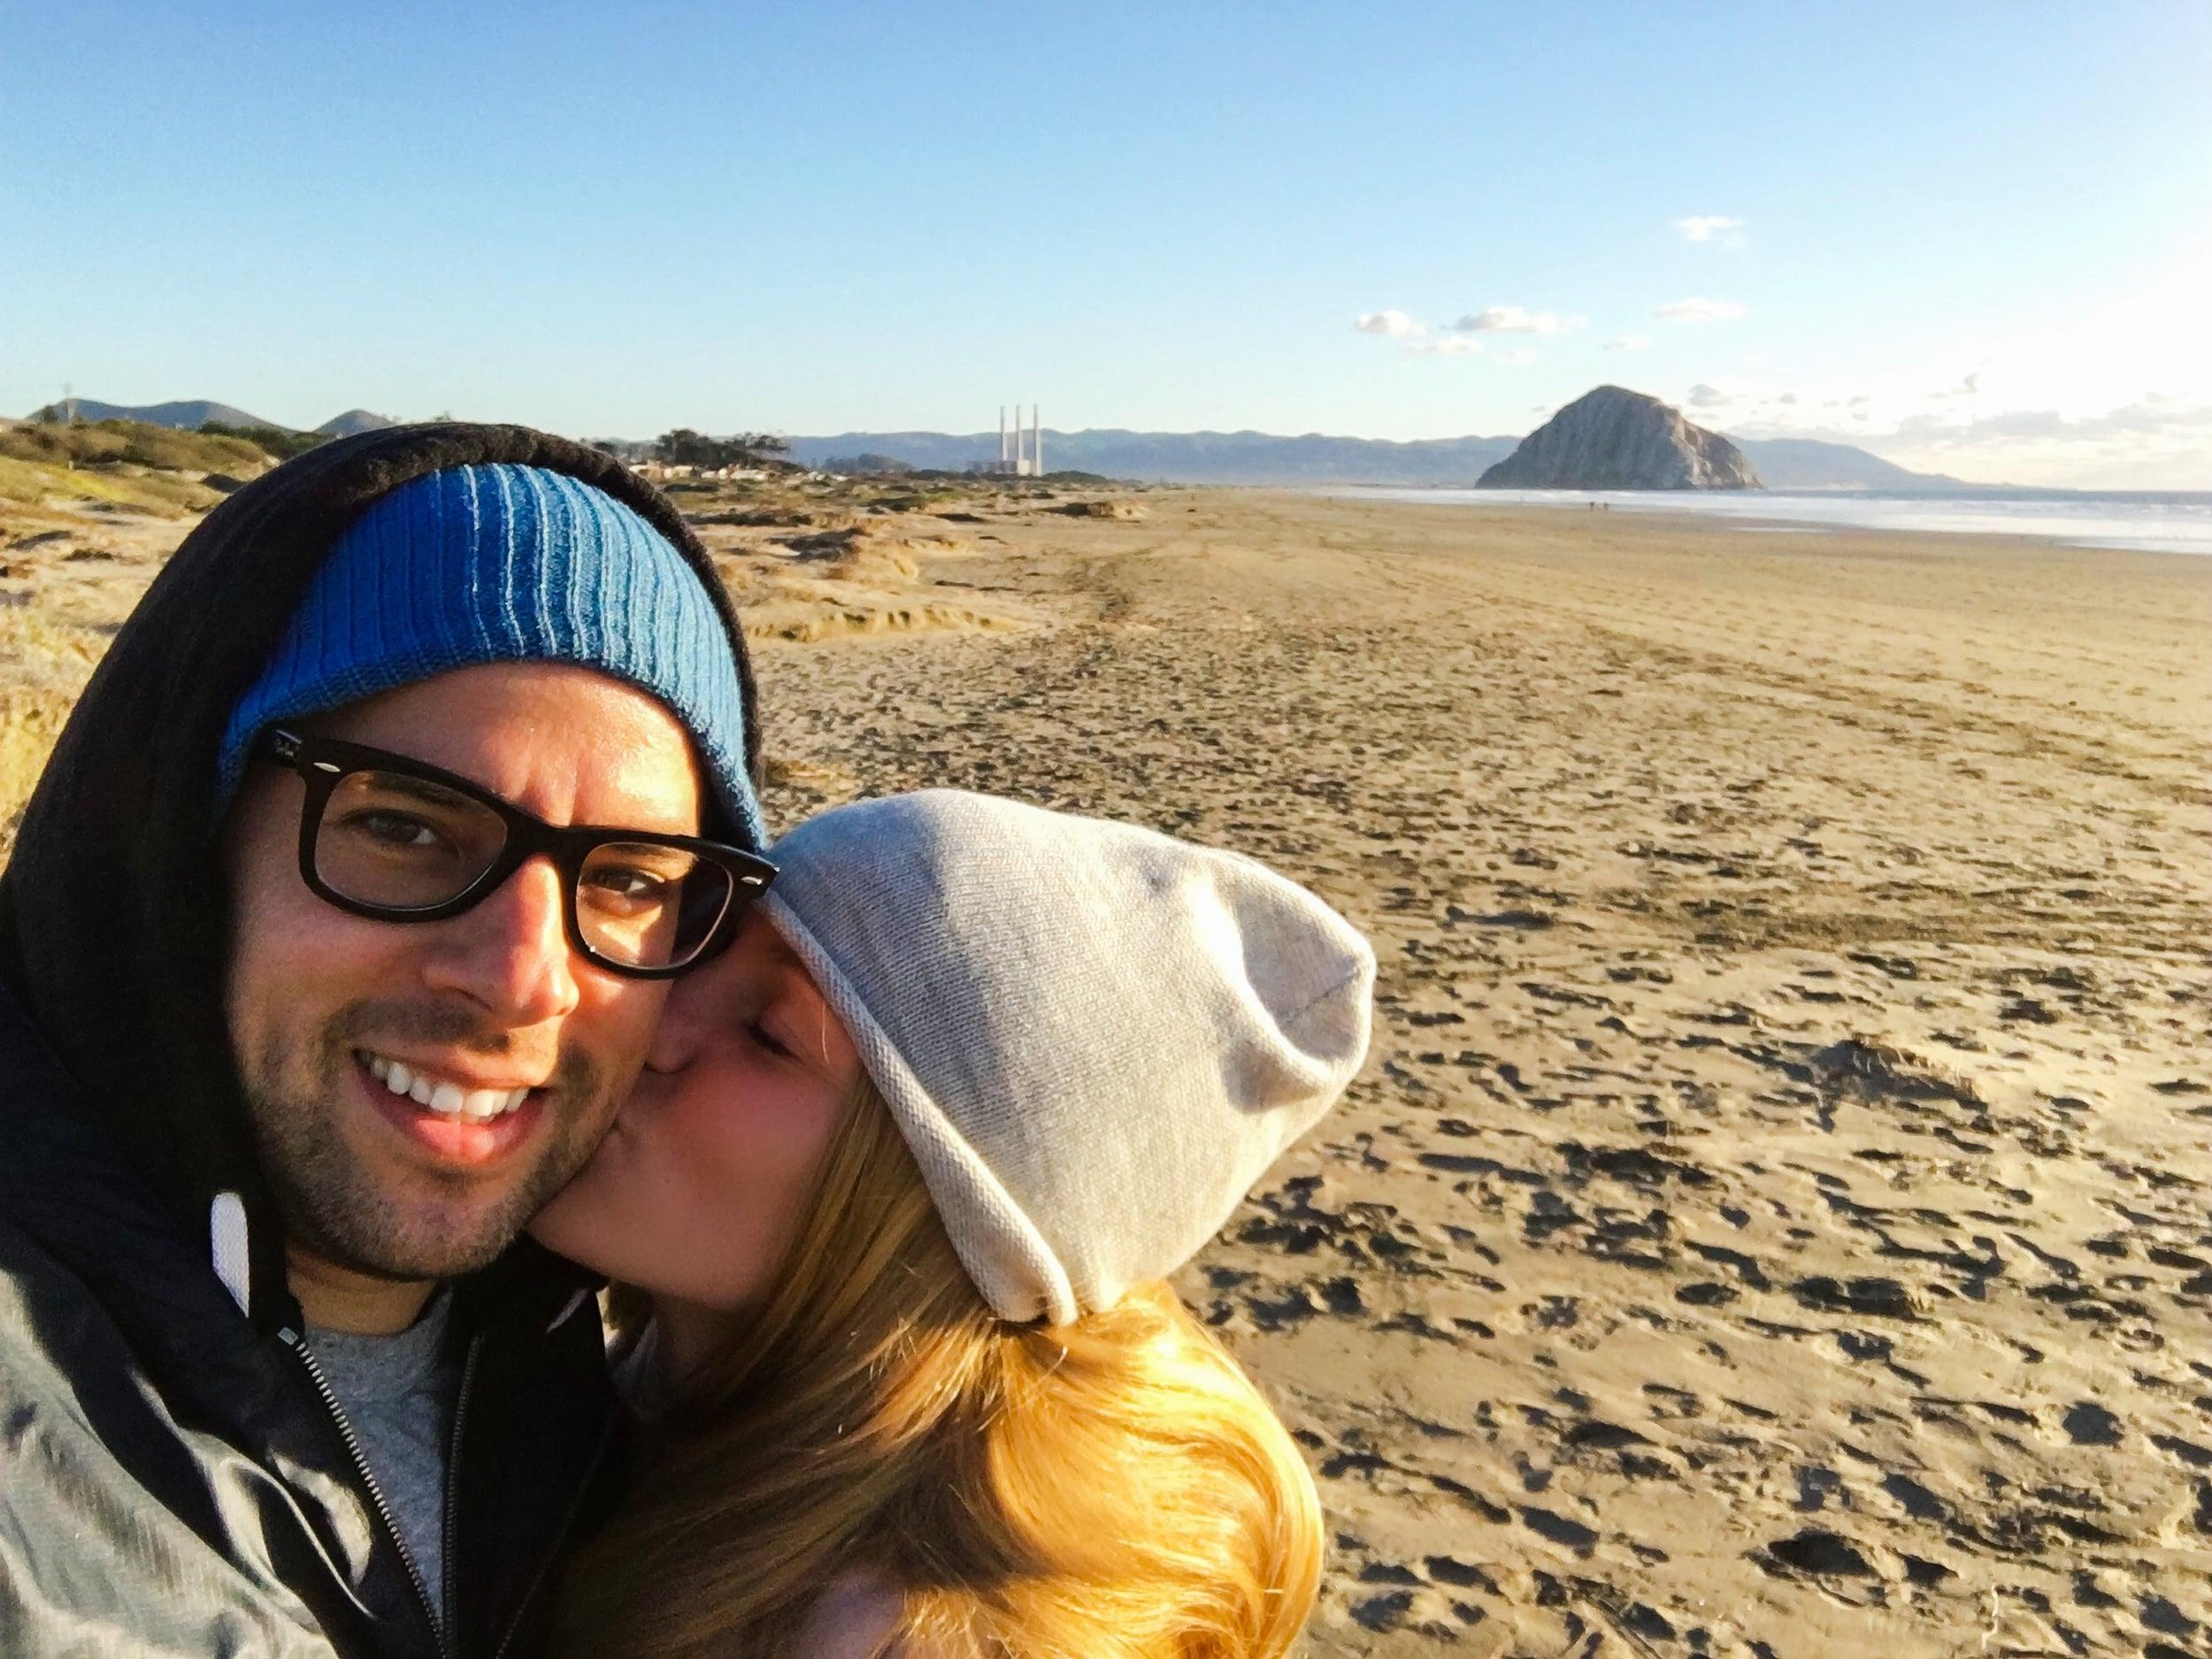 Morro Strand Beach, CA